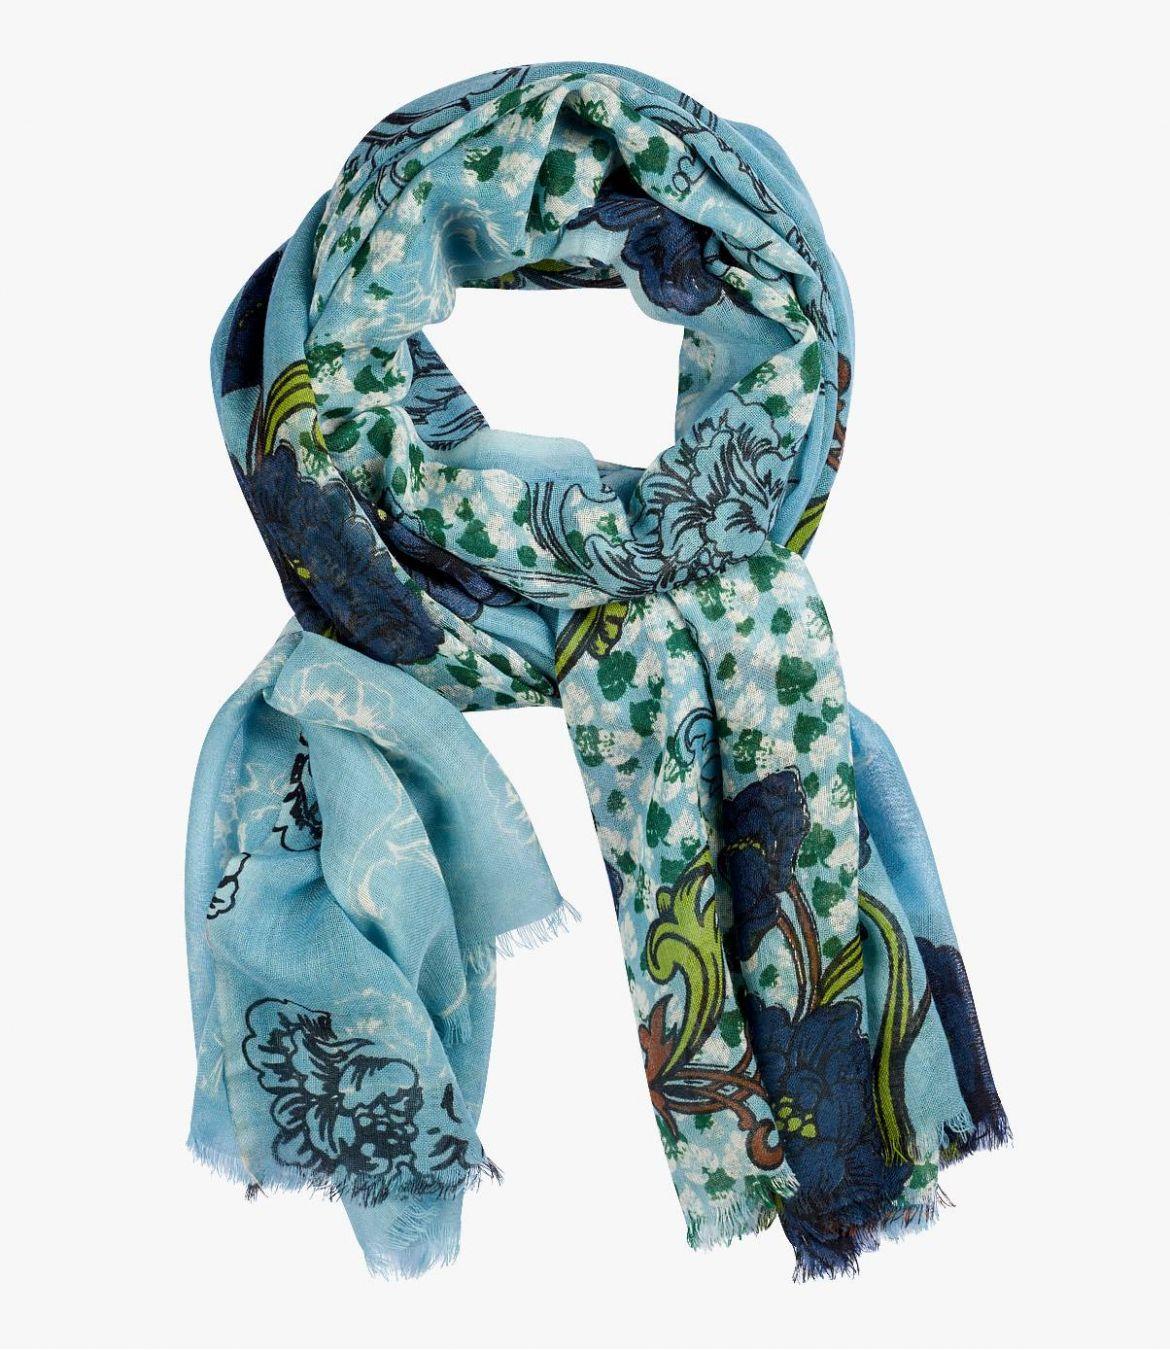 SENS Women's Wool Scarf 100x200 cm Storiatipic - 1